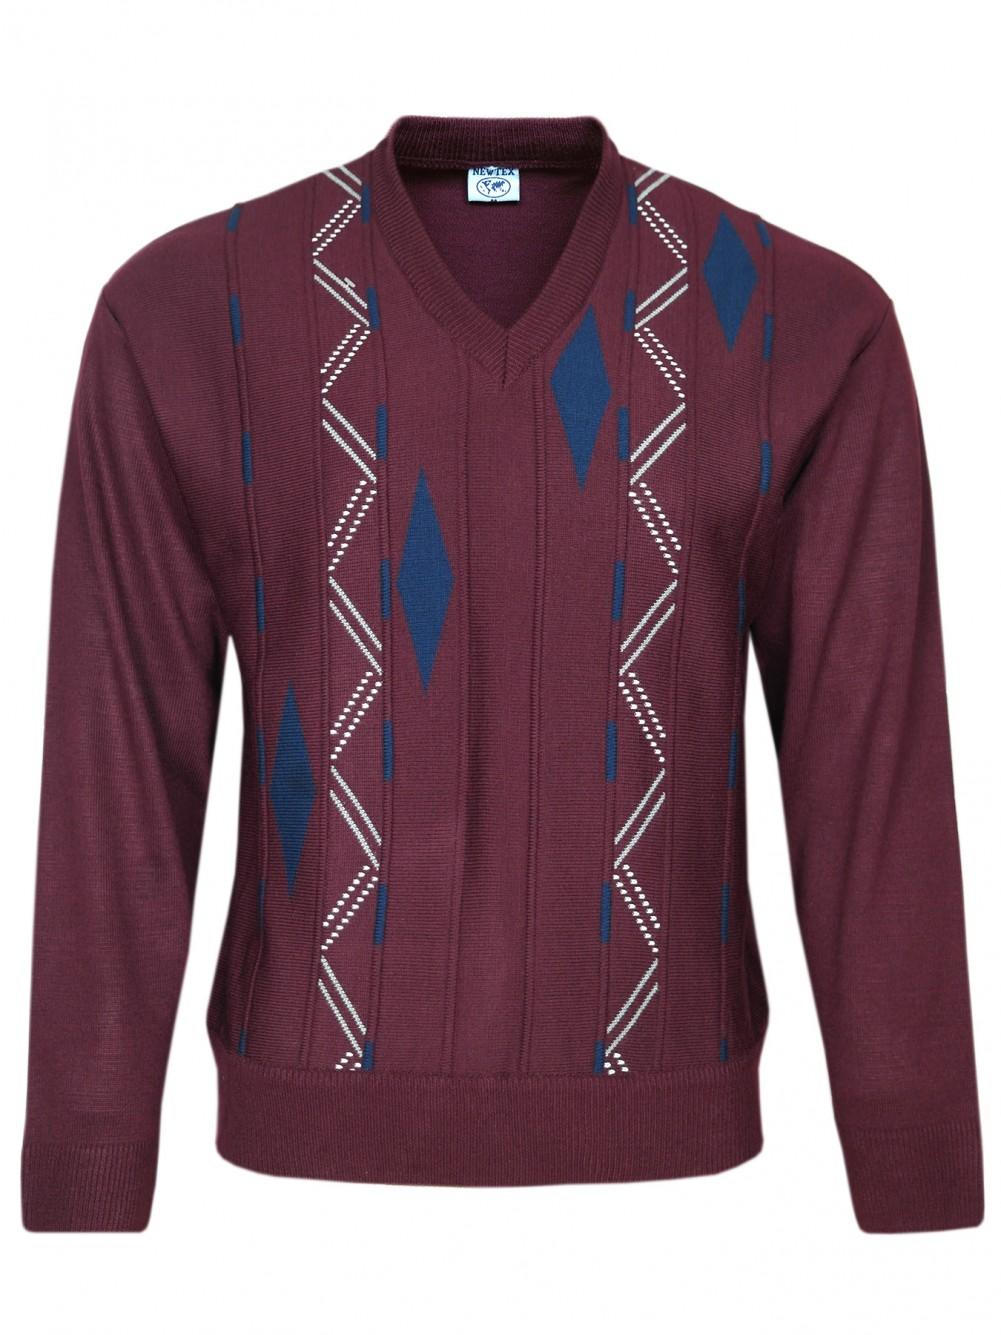 V-Ausschnitt-Pullover Langarm Herren Pullover - Weinrot